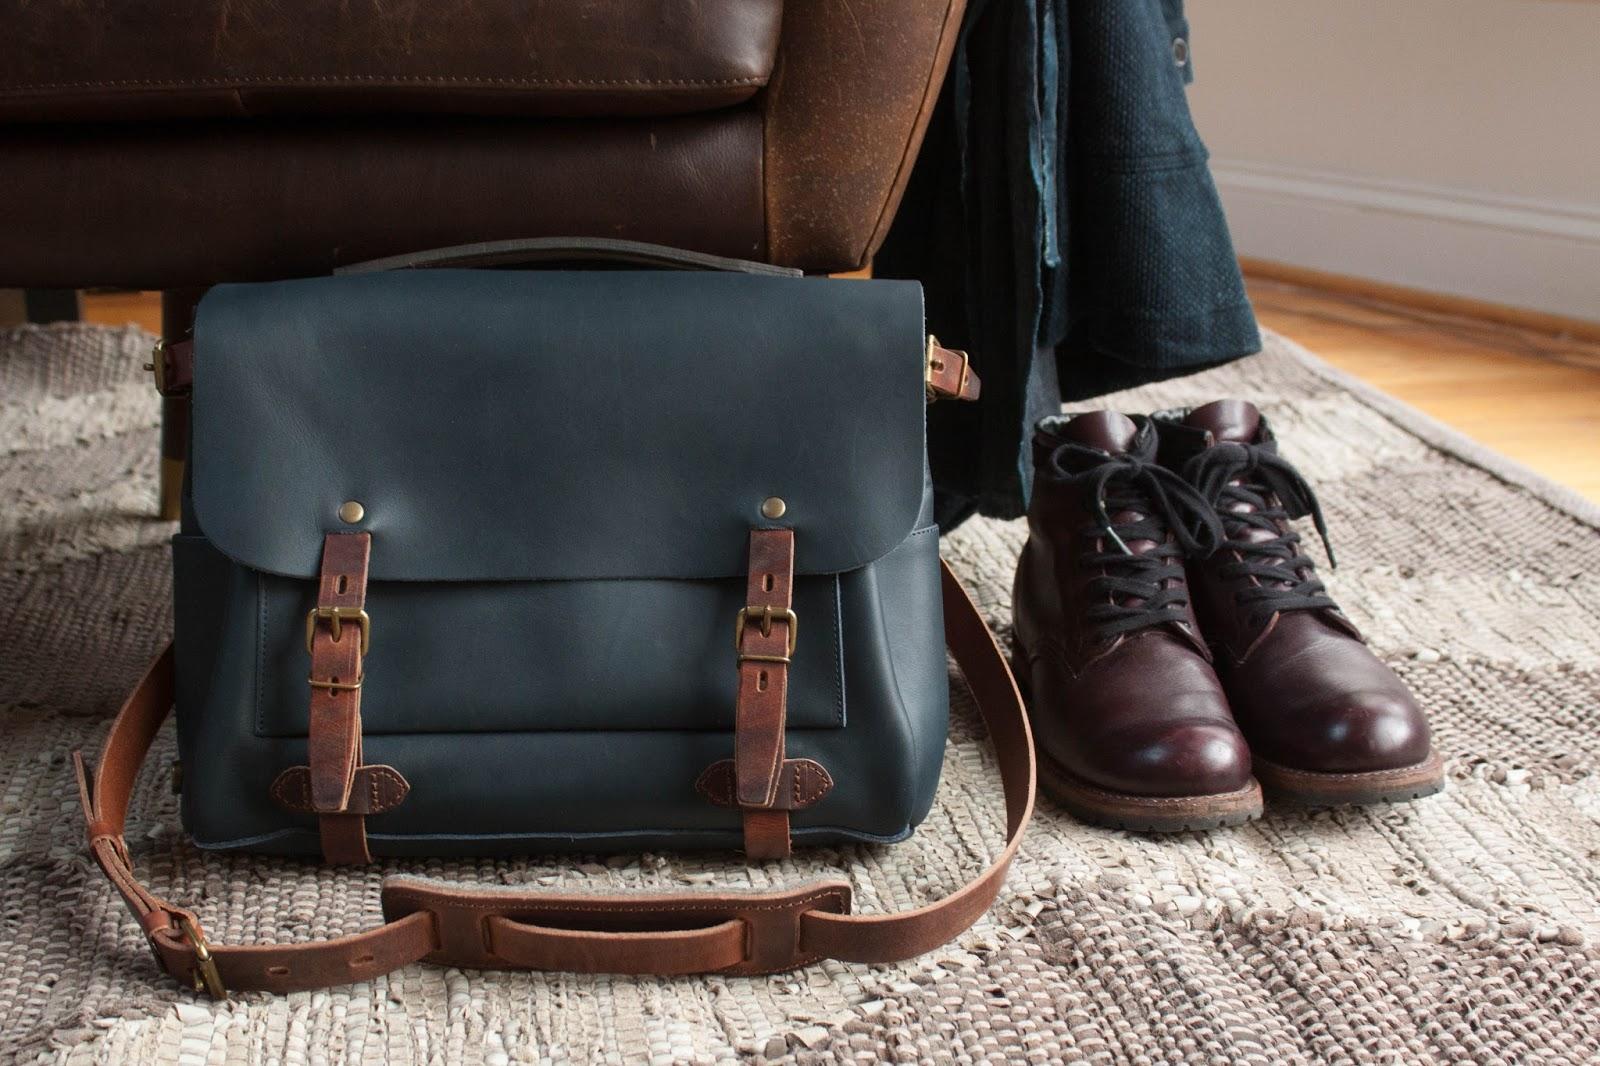 First Impressions - A Brand New Bag - Bleu de Chauffe Éclair Postman 04f7d04d271d1